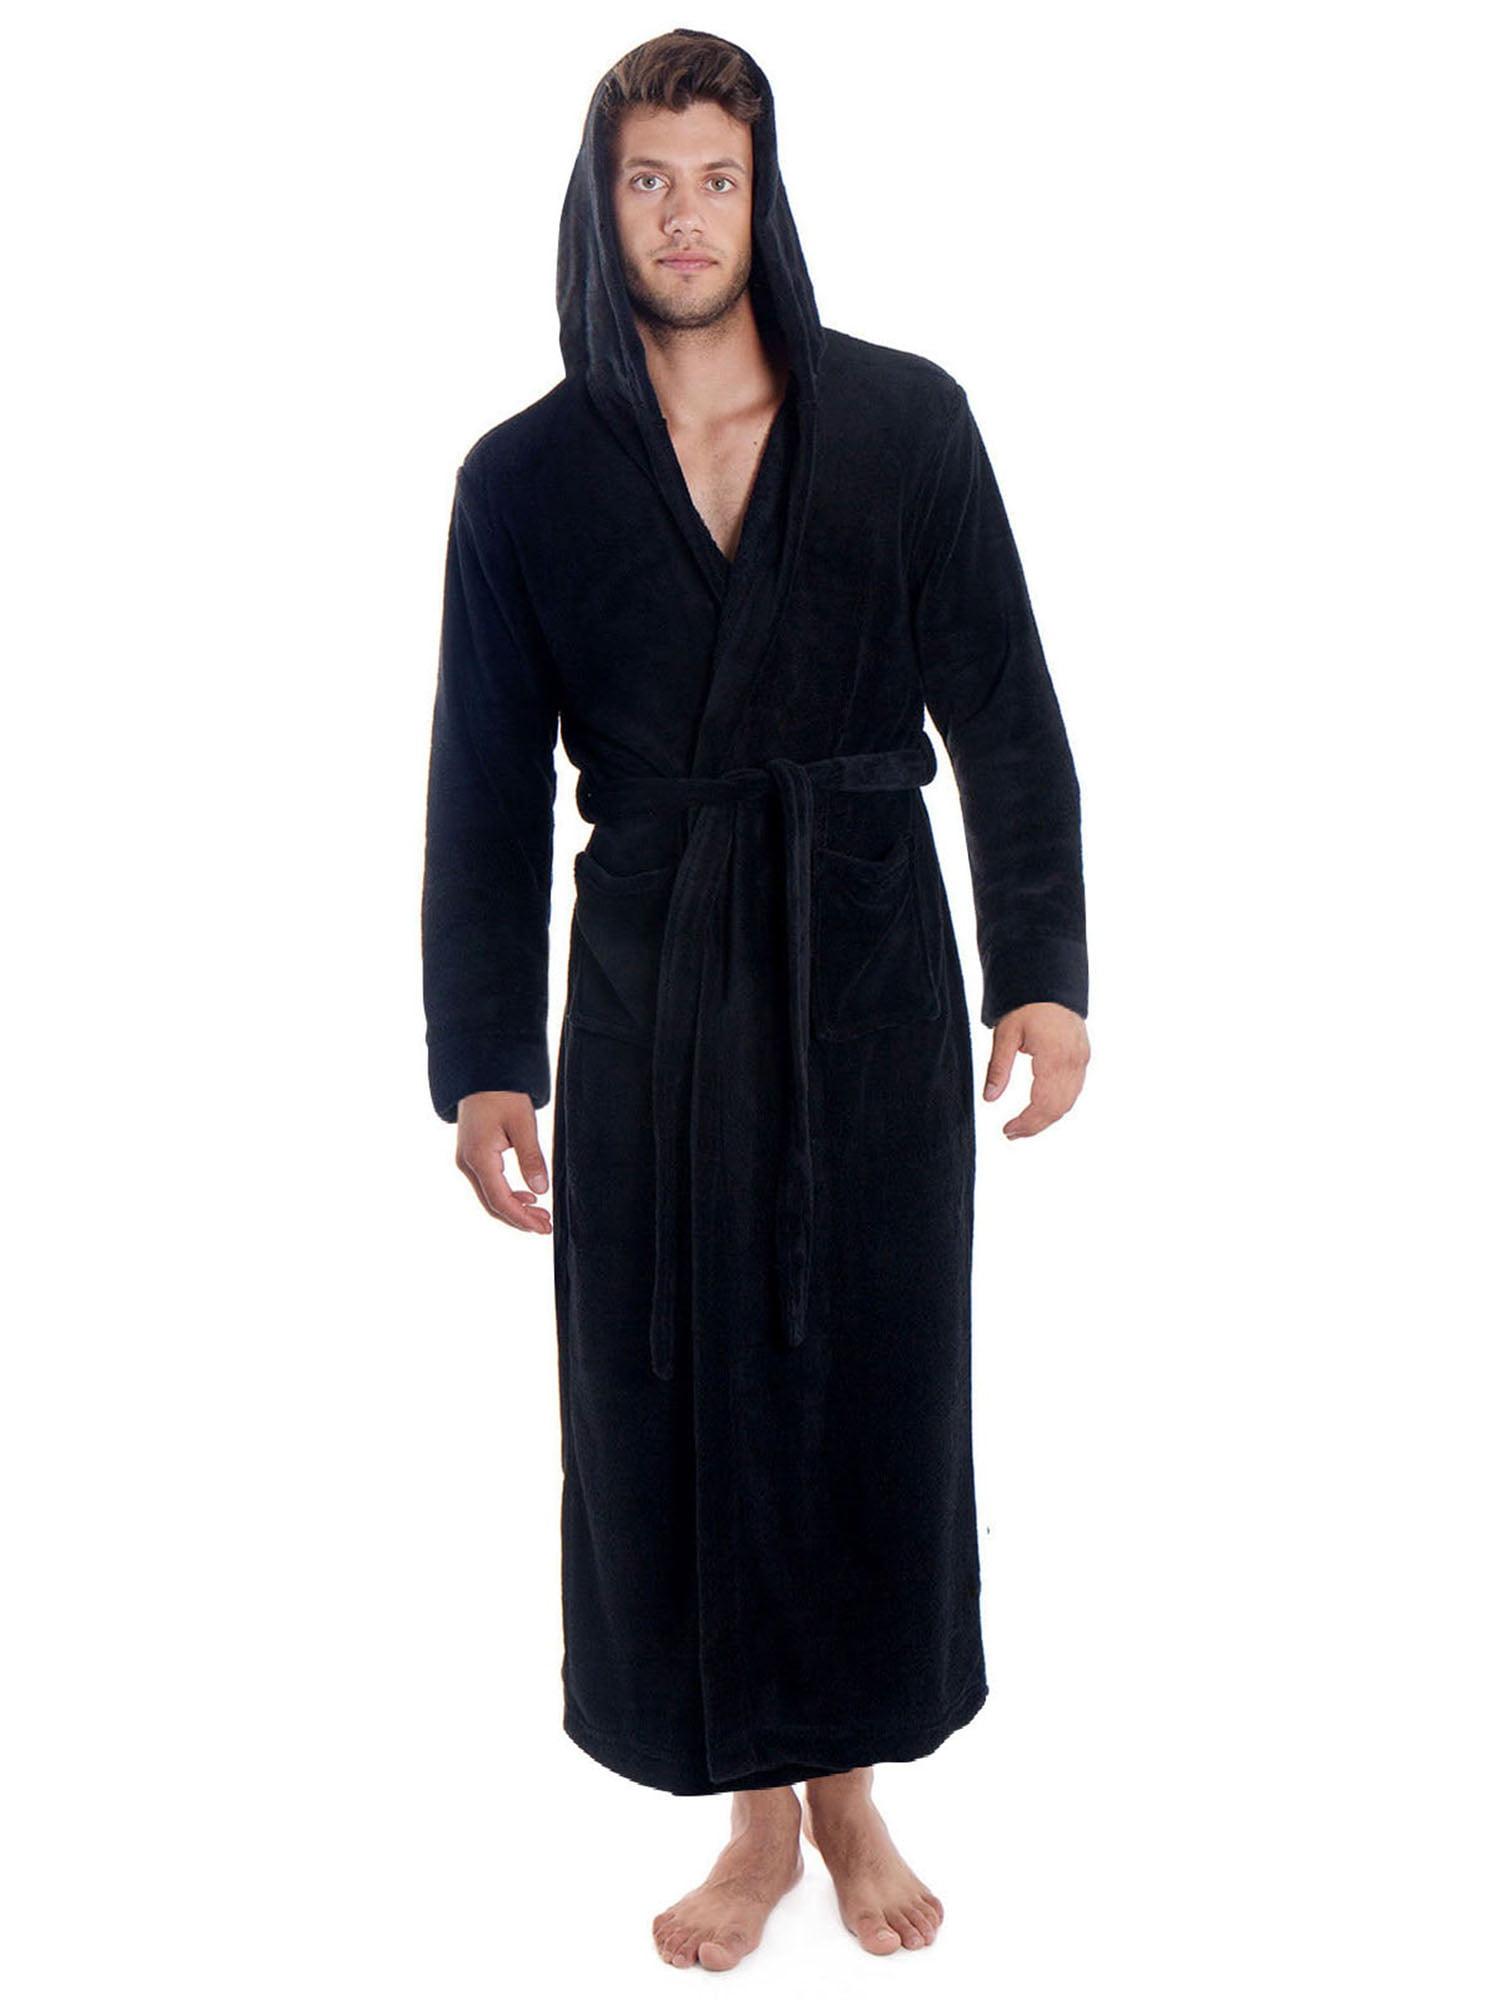 Unisex Hooded Bath Robe in White Sizes XL 2XL 3XL